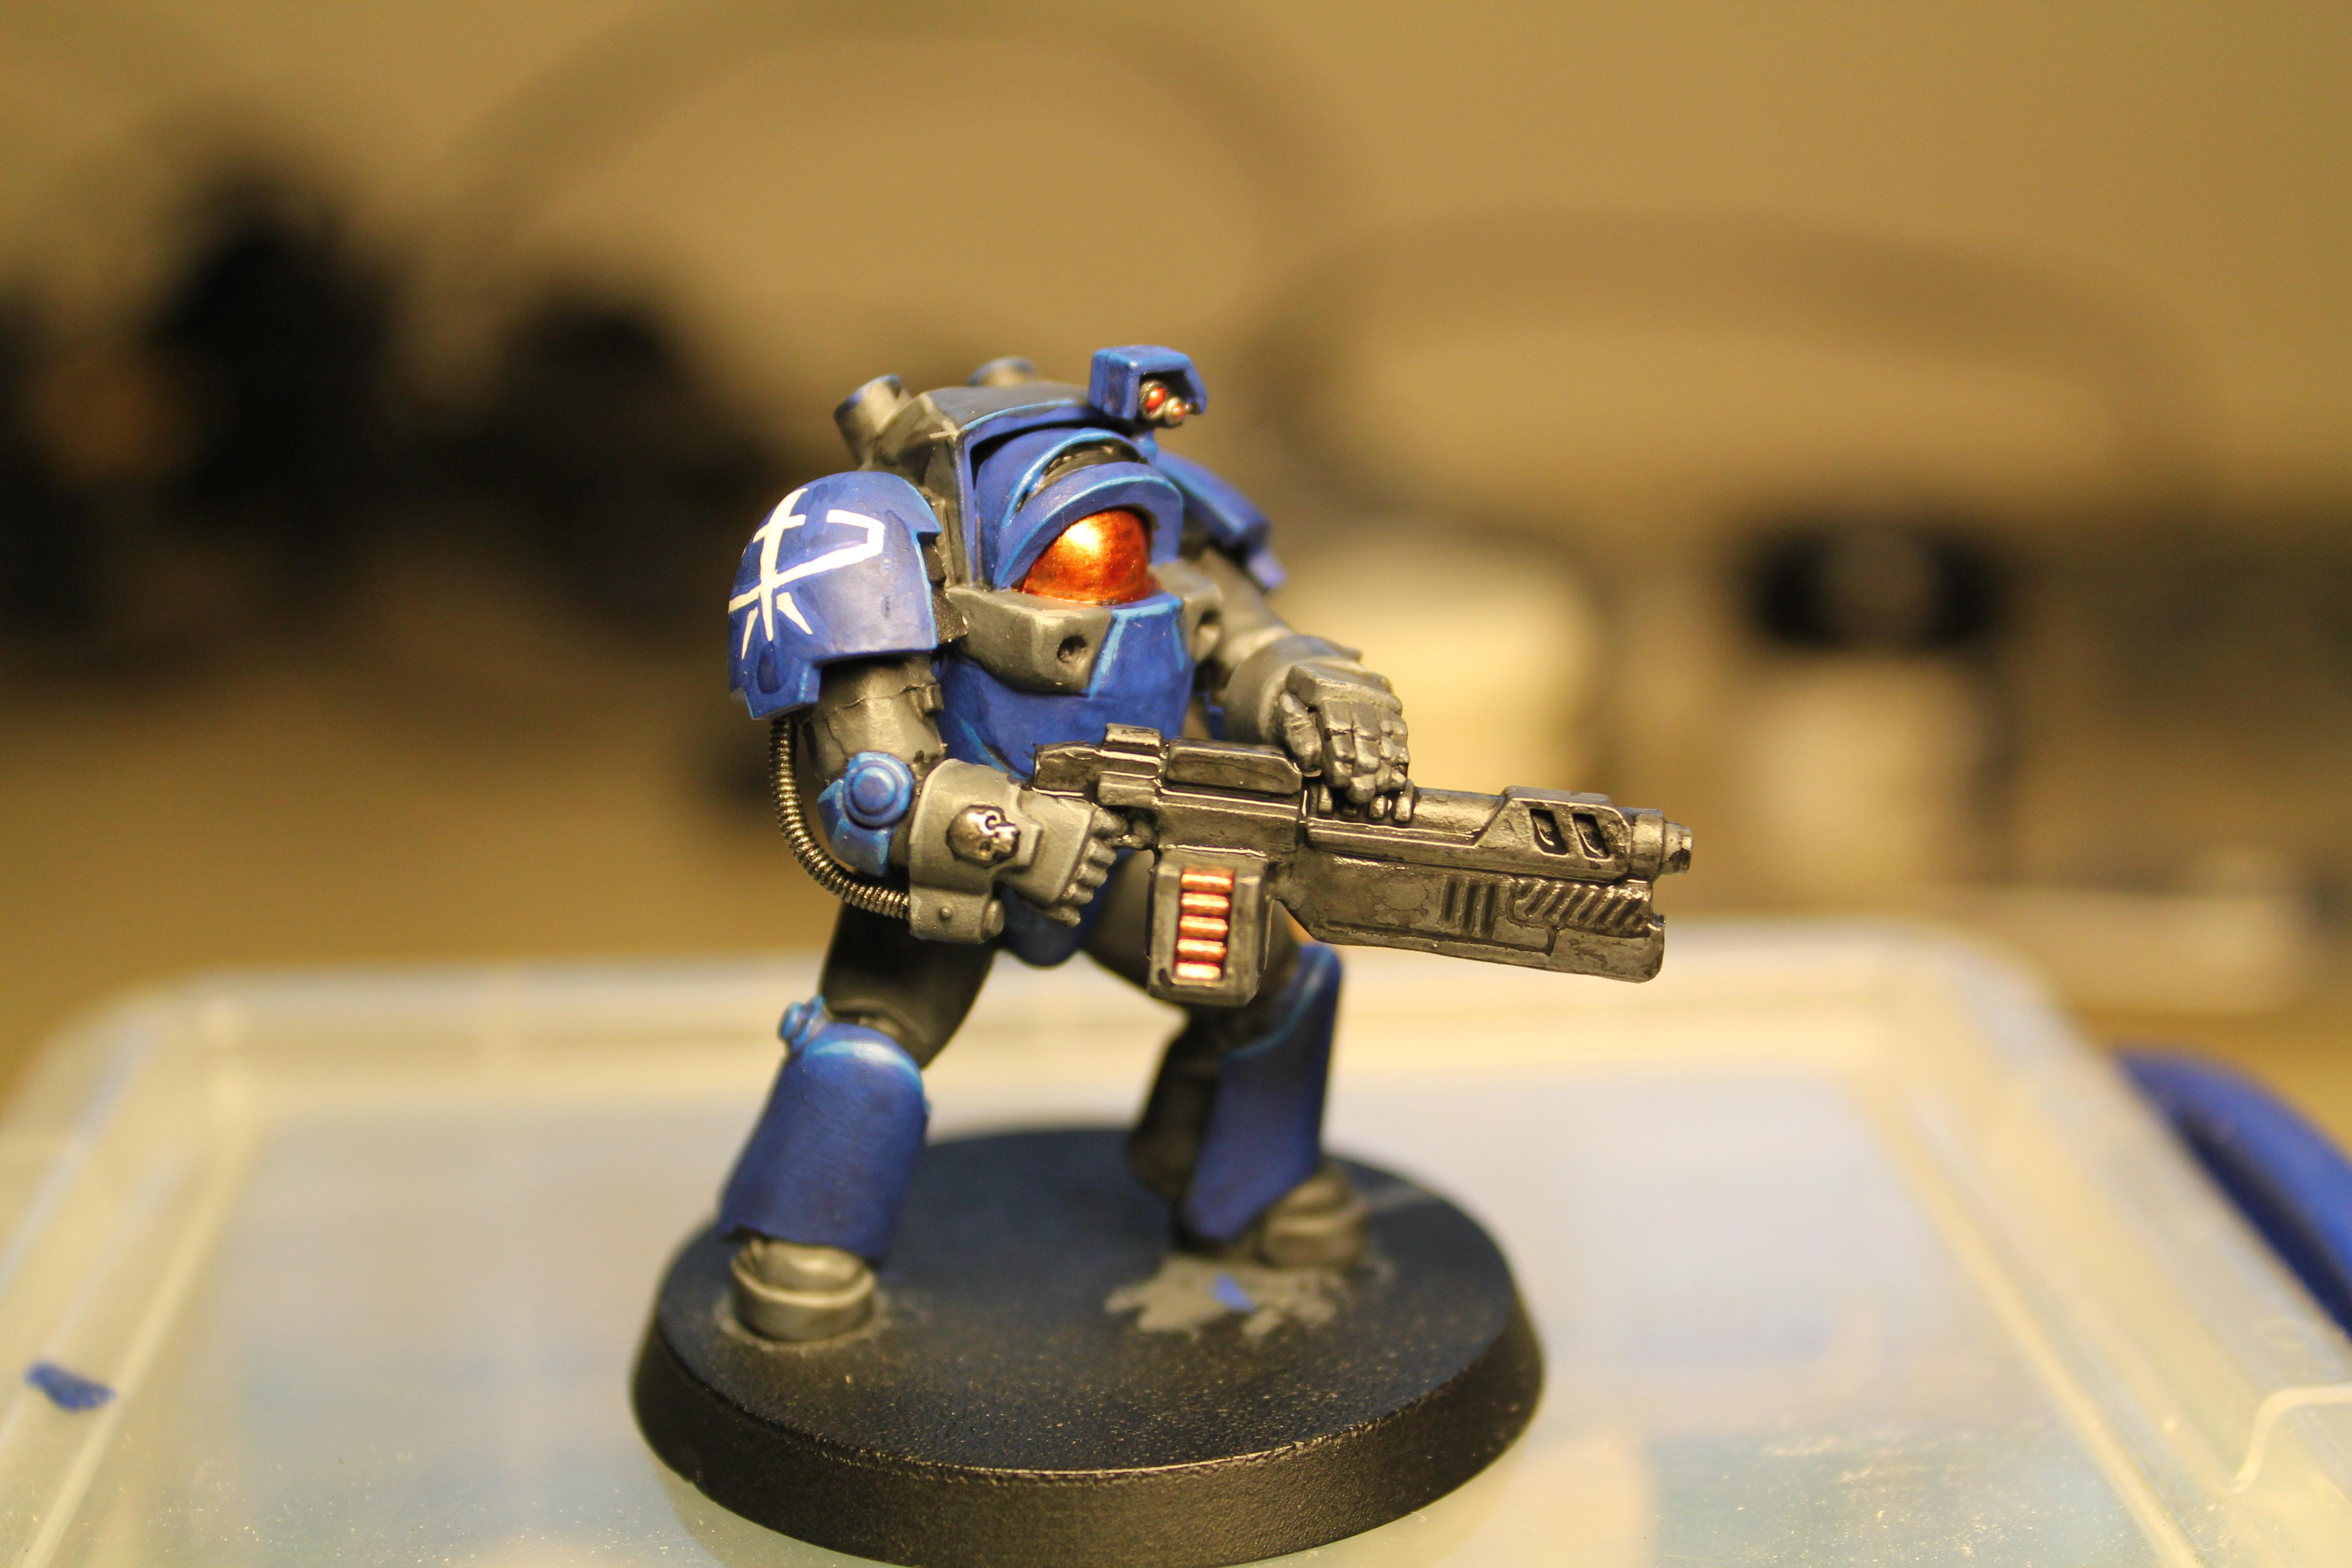 Deathwing, Sc2, Starcraft, Terminator Armor, Terran